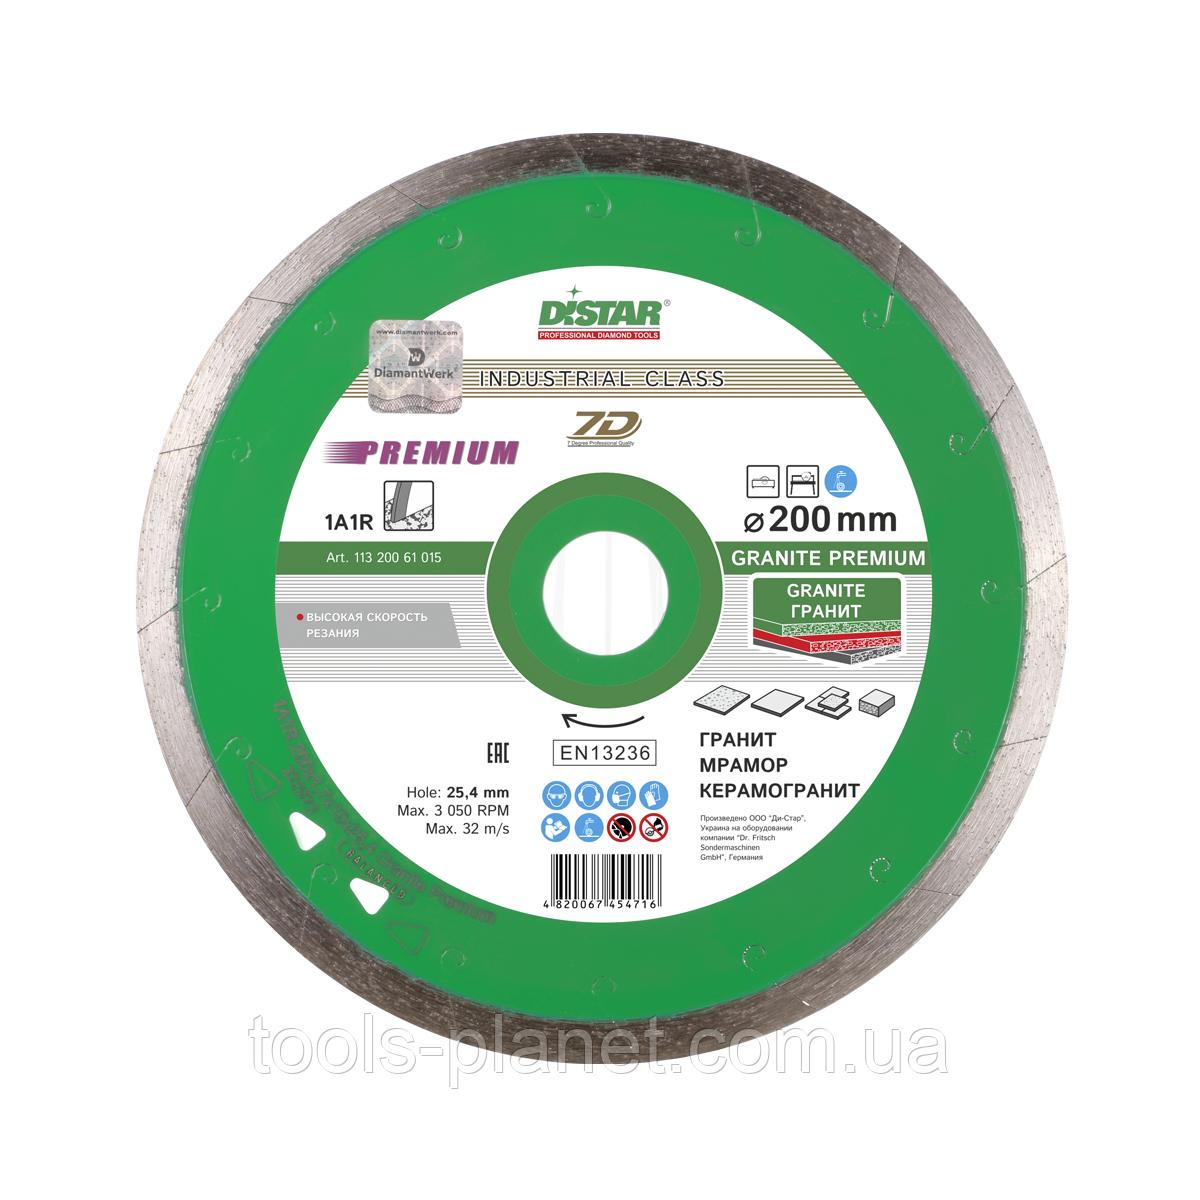 Алмазный диск Distar 1A1R 200 x 1,7 x 10 x 25,4 Granite Premium 7D (11320061015)